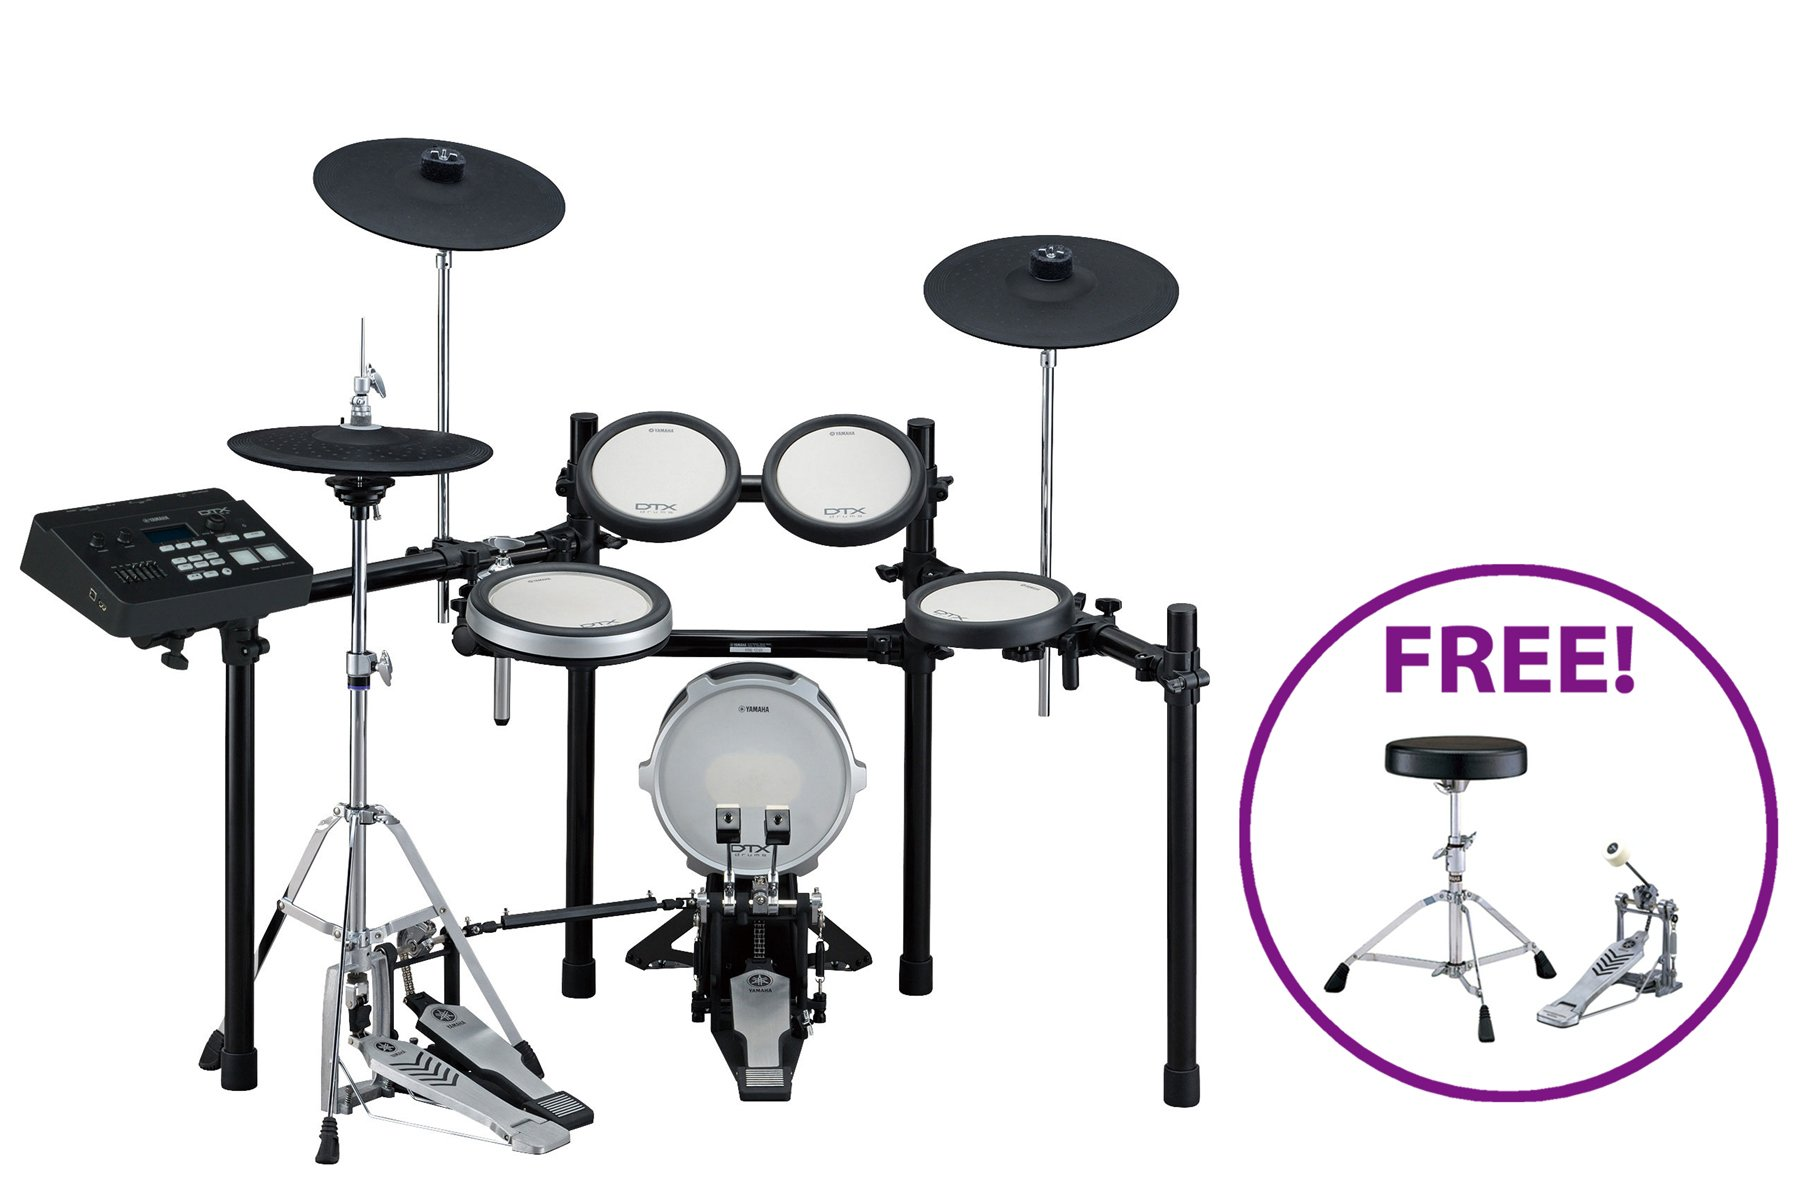 Yamaha DTX720K Drum Kit Full Compass Exclusive Bundle